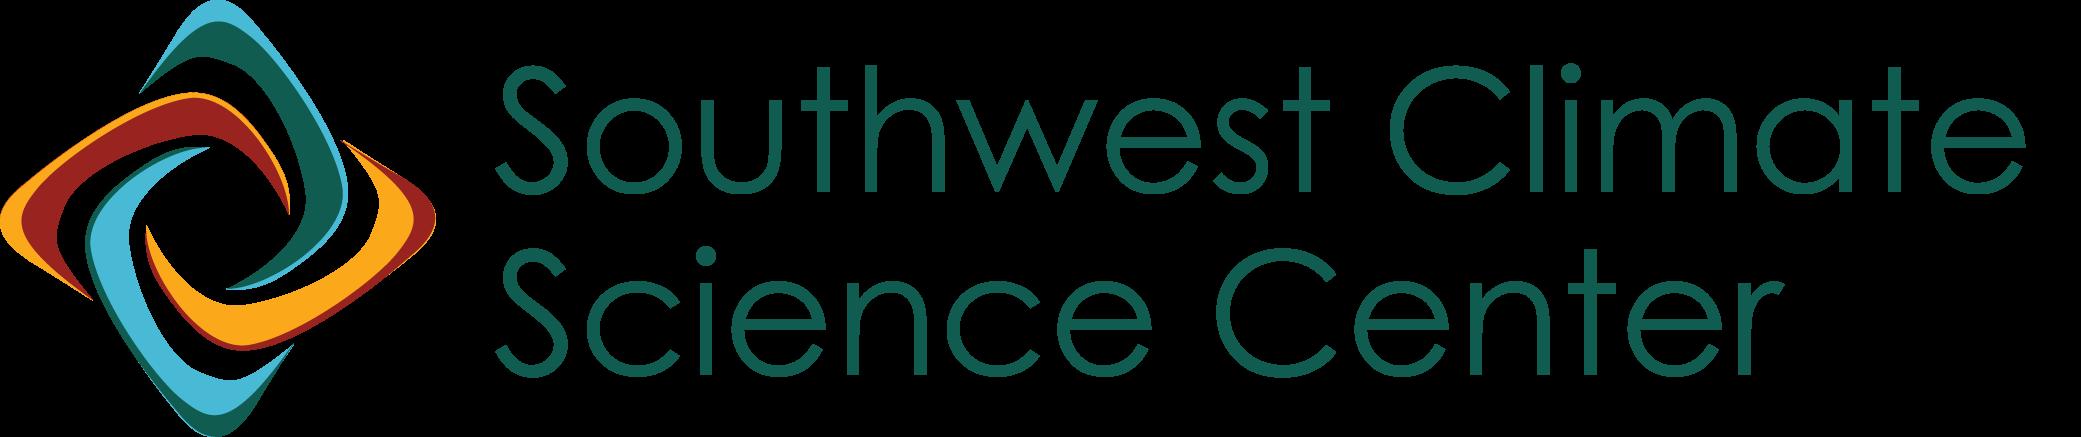 Southwest Climate Science Center